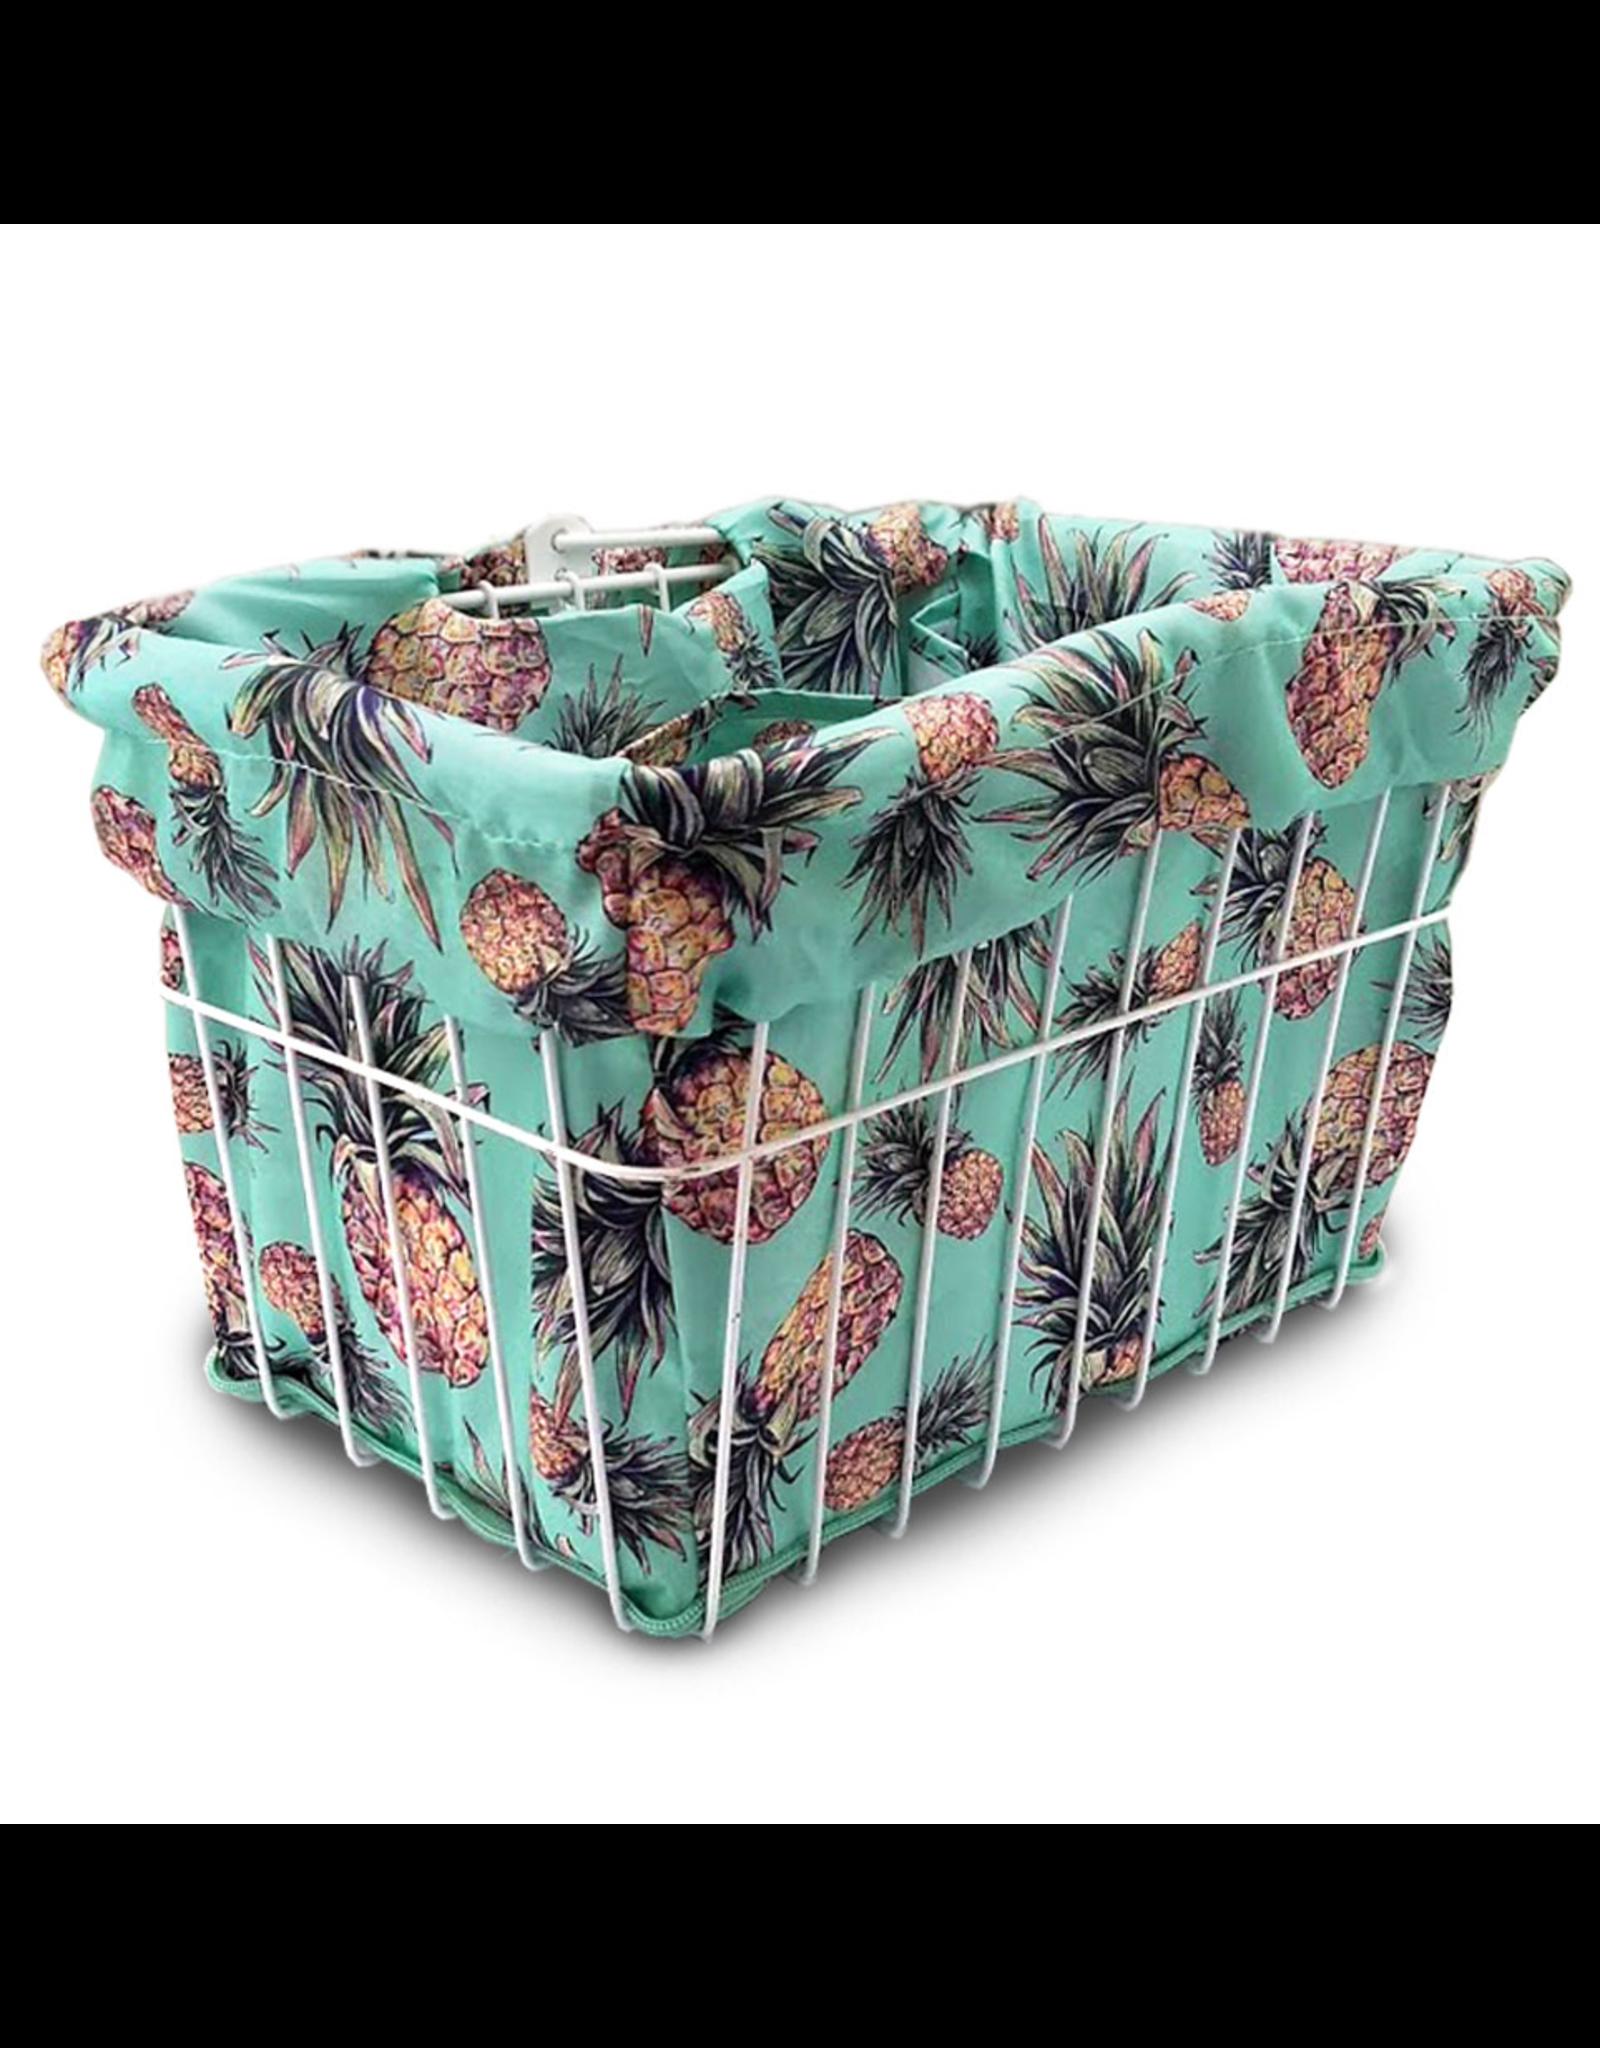 Cruiser Candy Cruiser Candy Basket Liner - Pineapple Fantasy